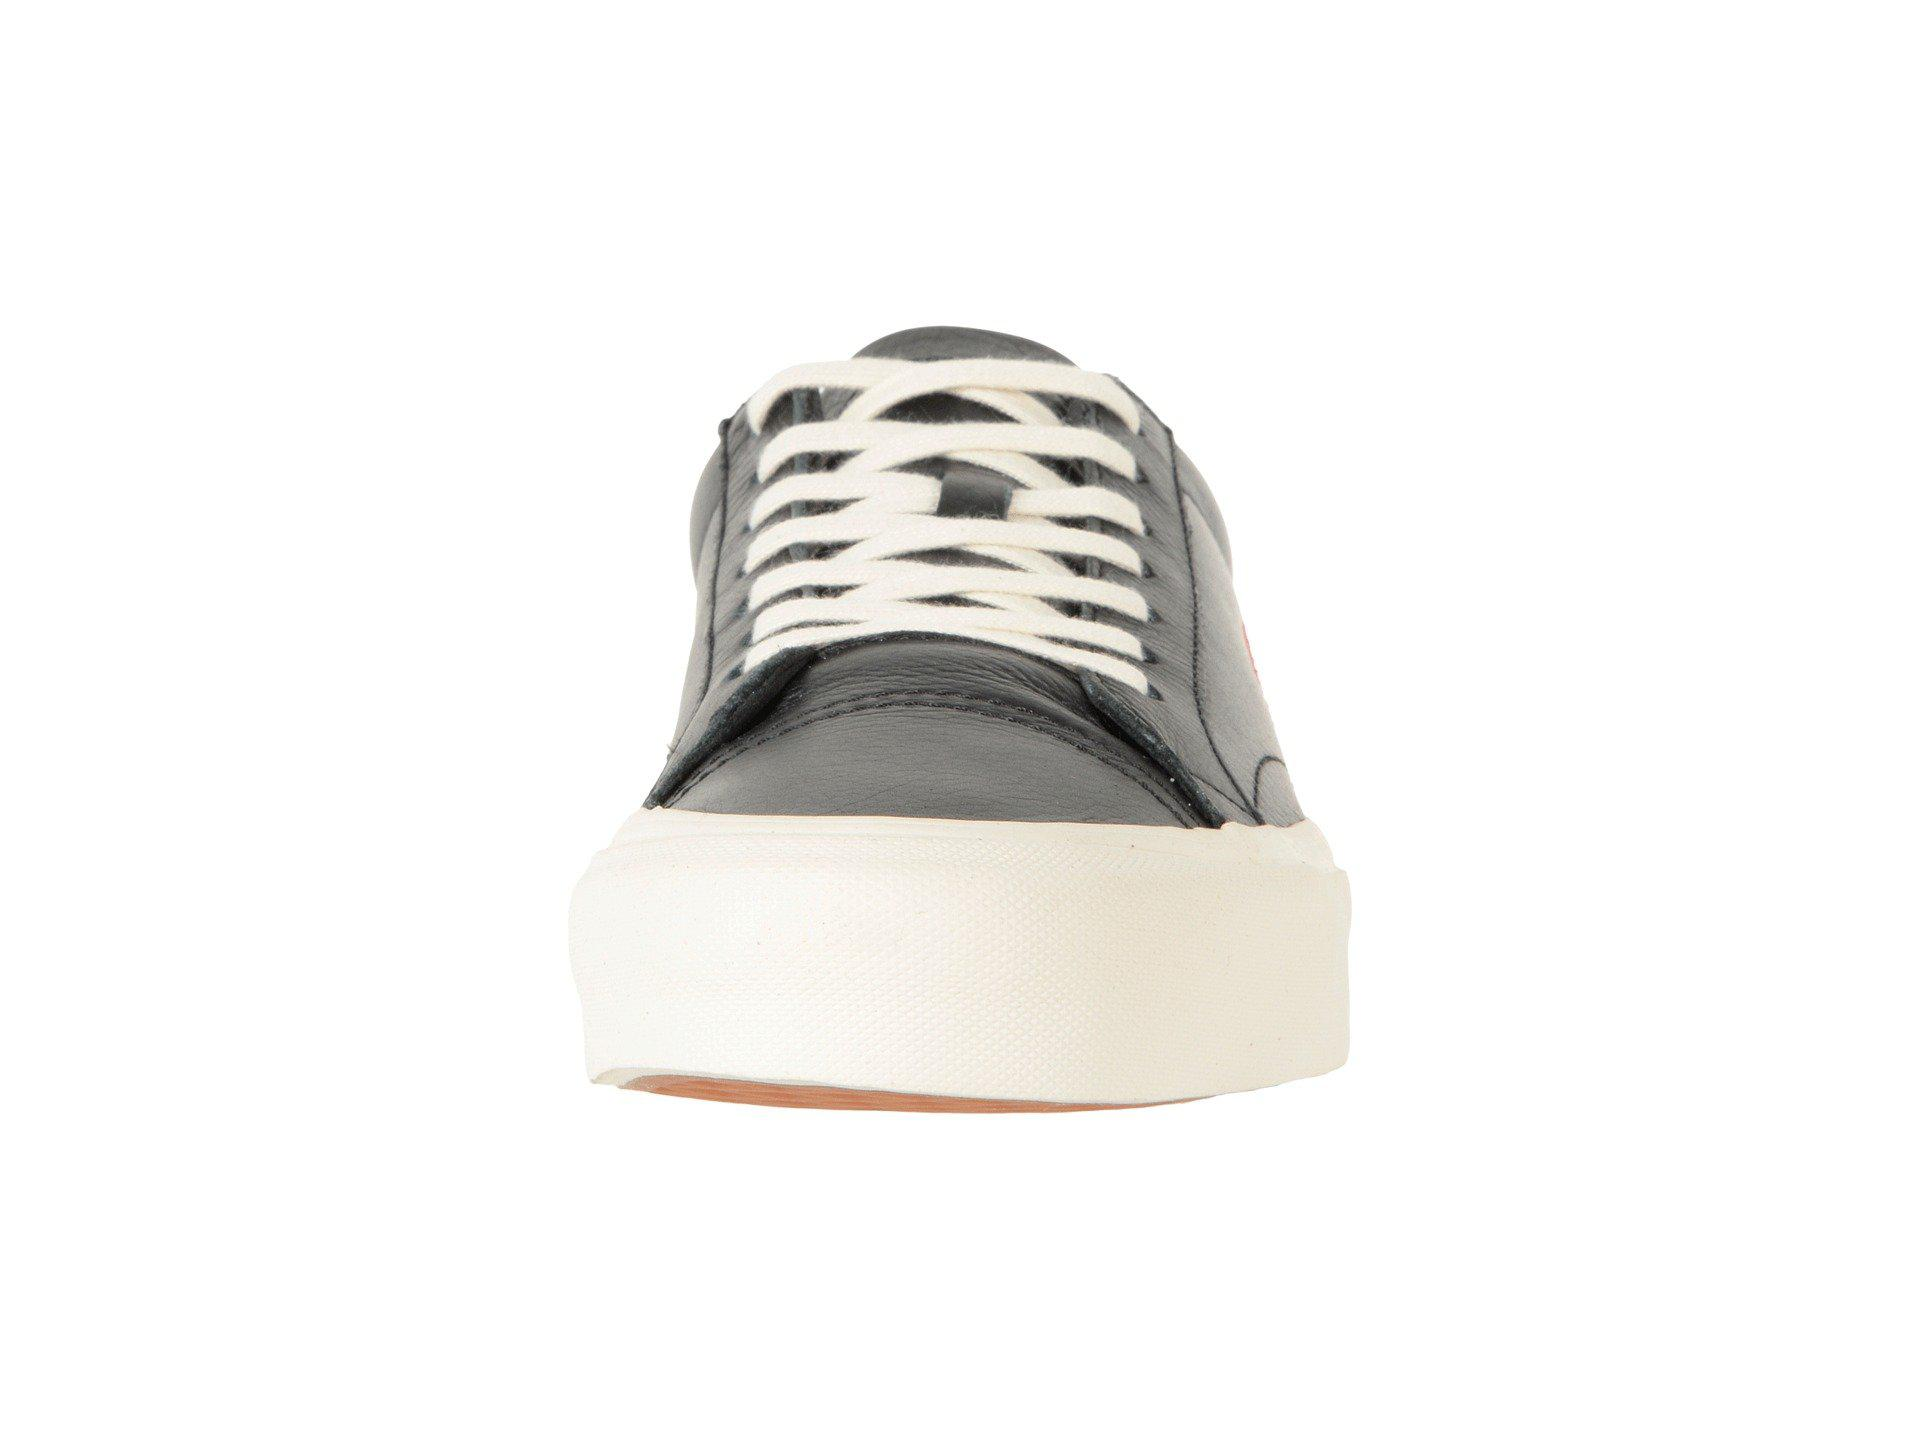 Lyst - Vans Court Icon (black cloud Dancer) Skate Shoes in Black for Men 4875b680e